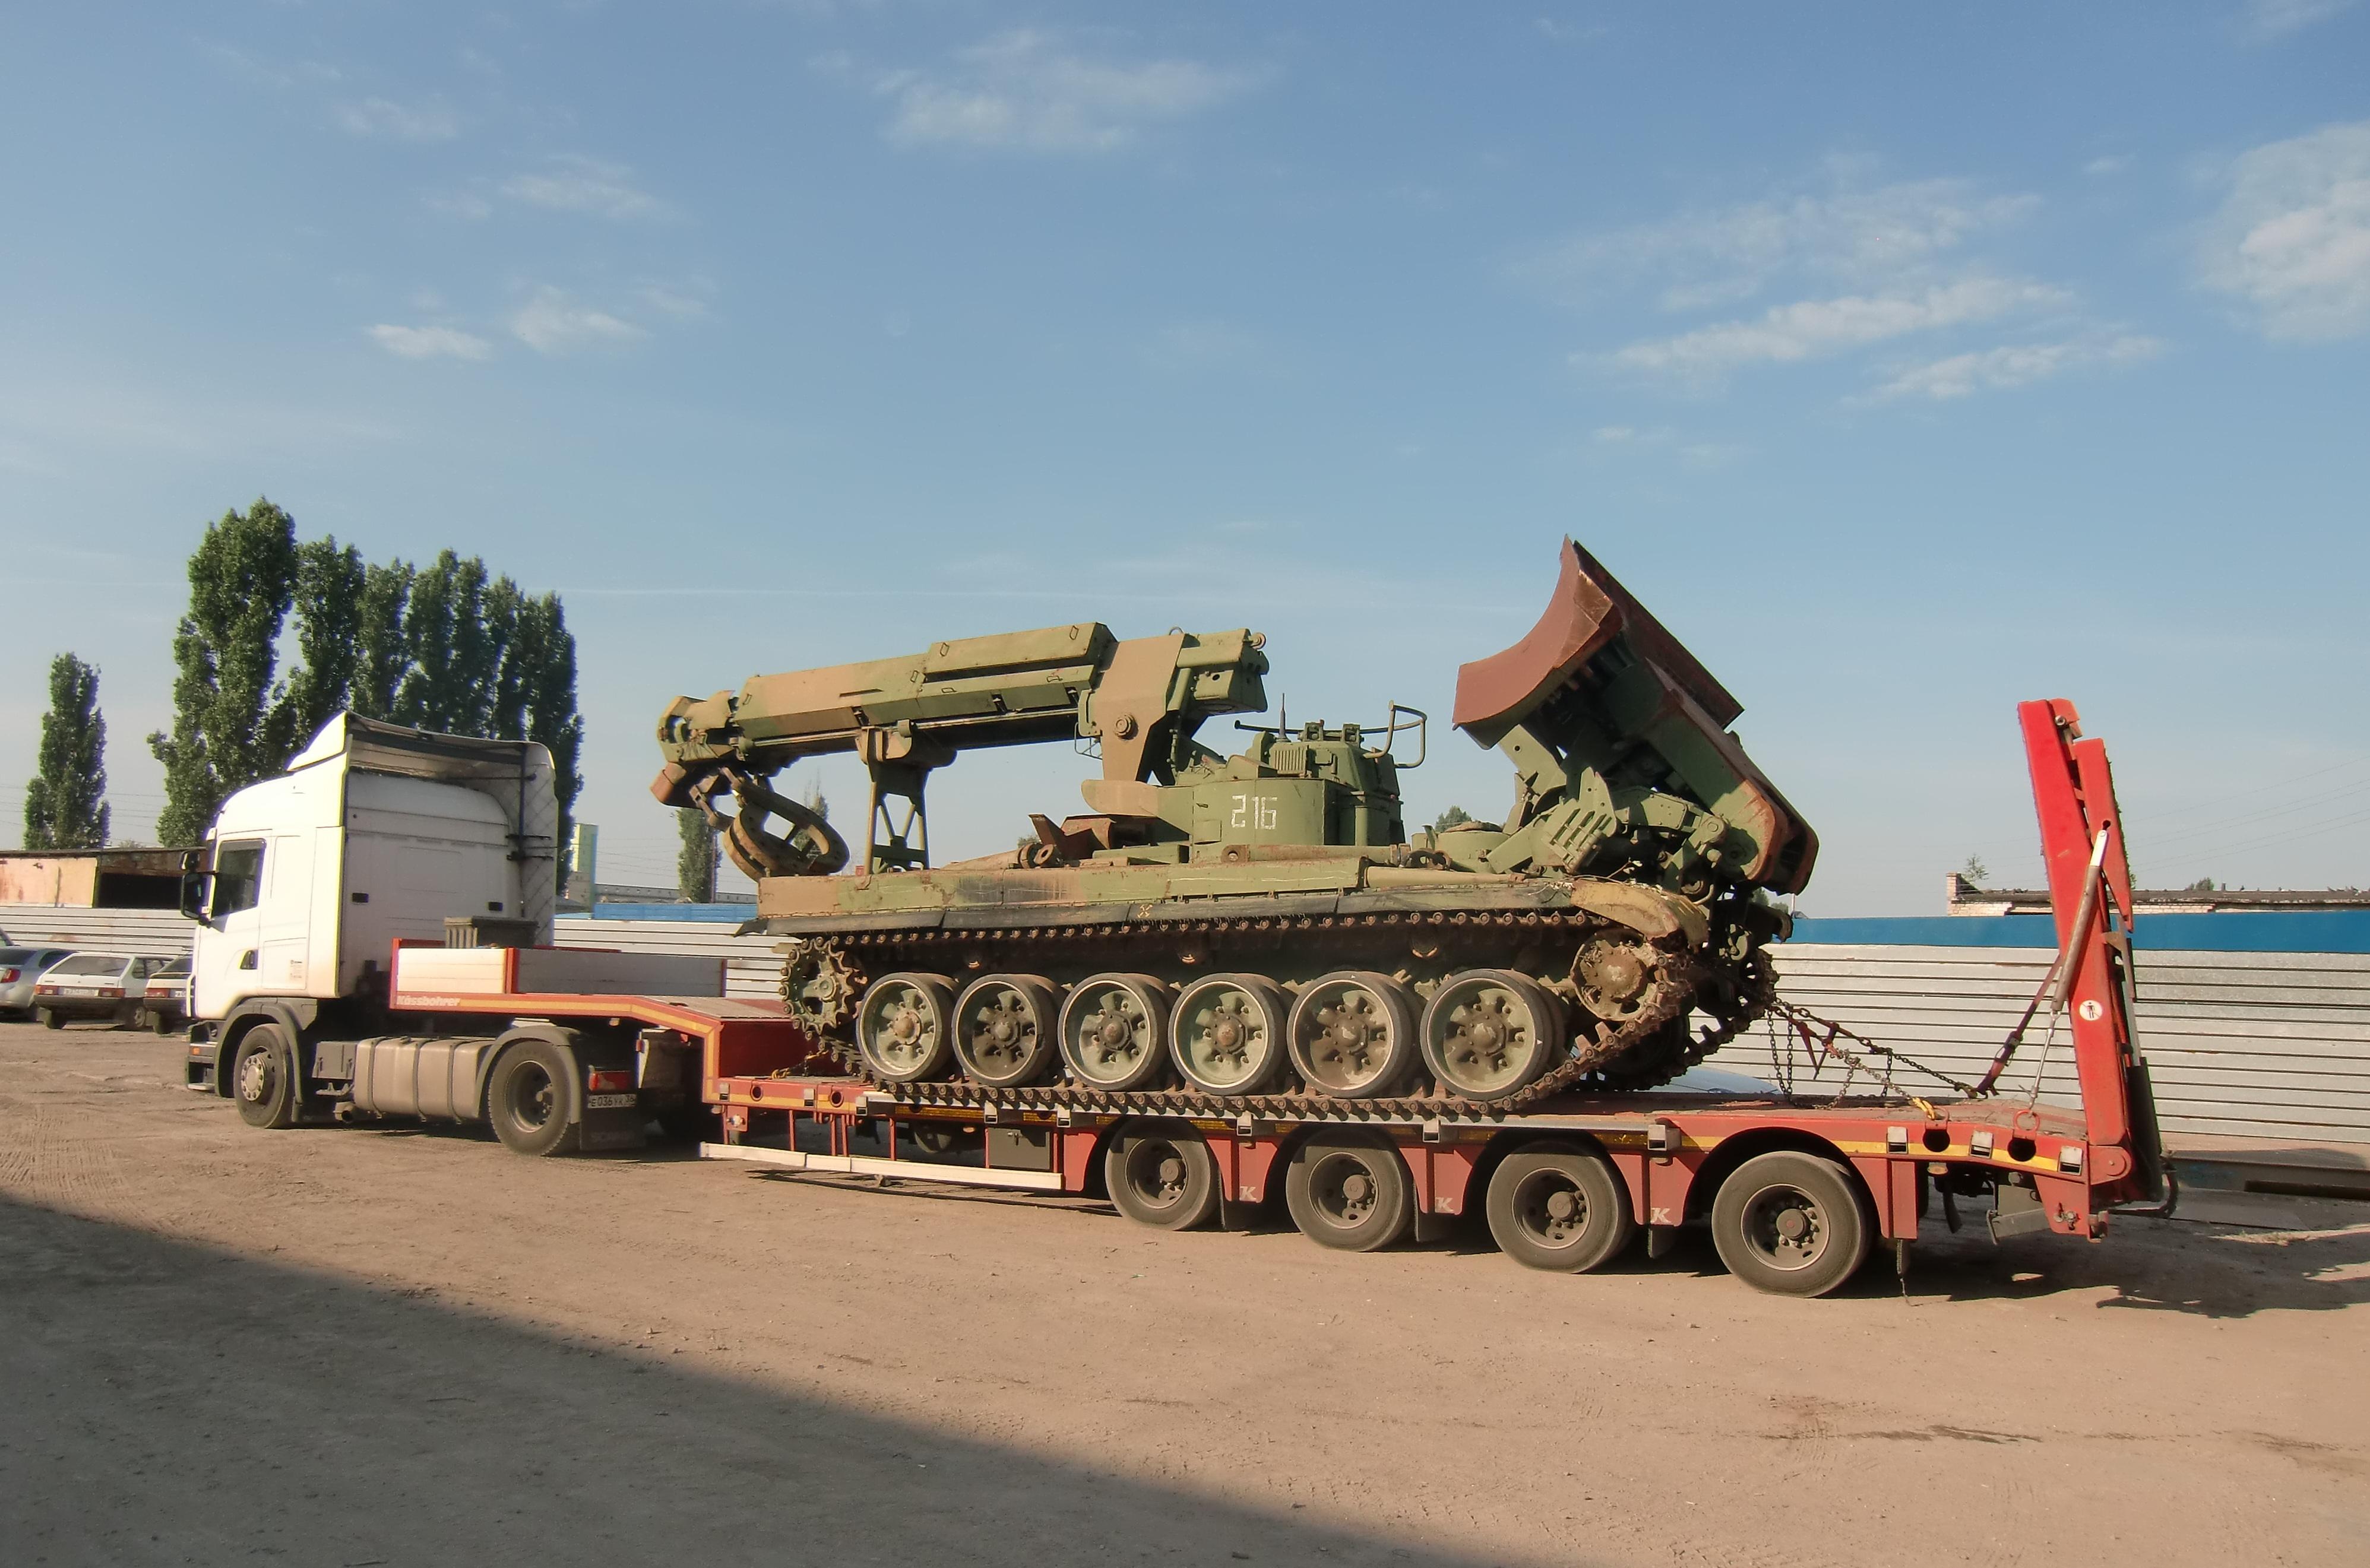 признание фото перевозки танка на трале смешно